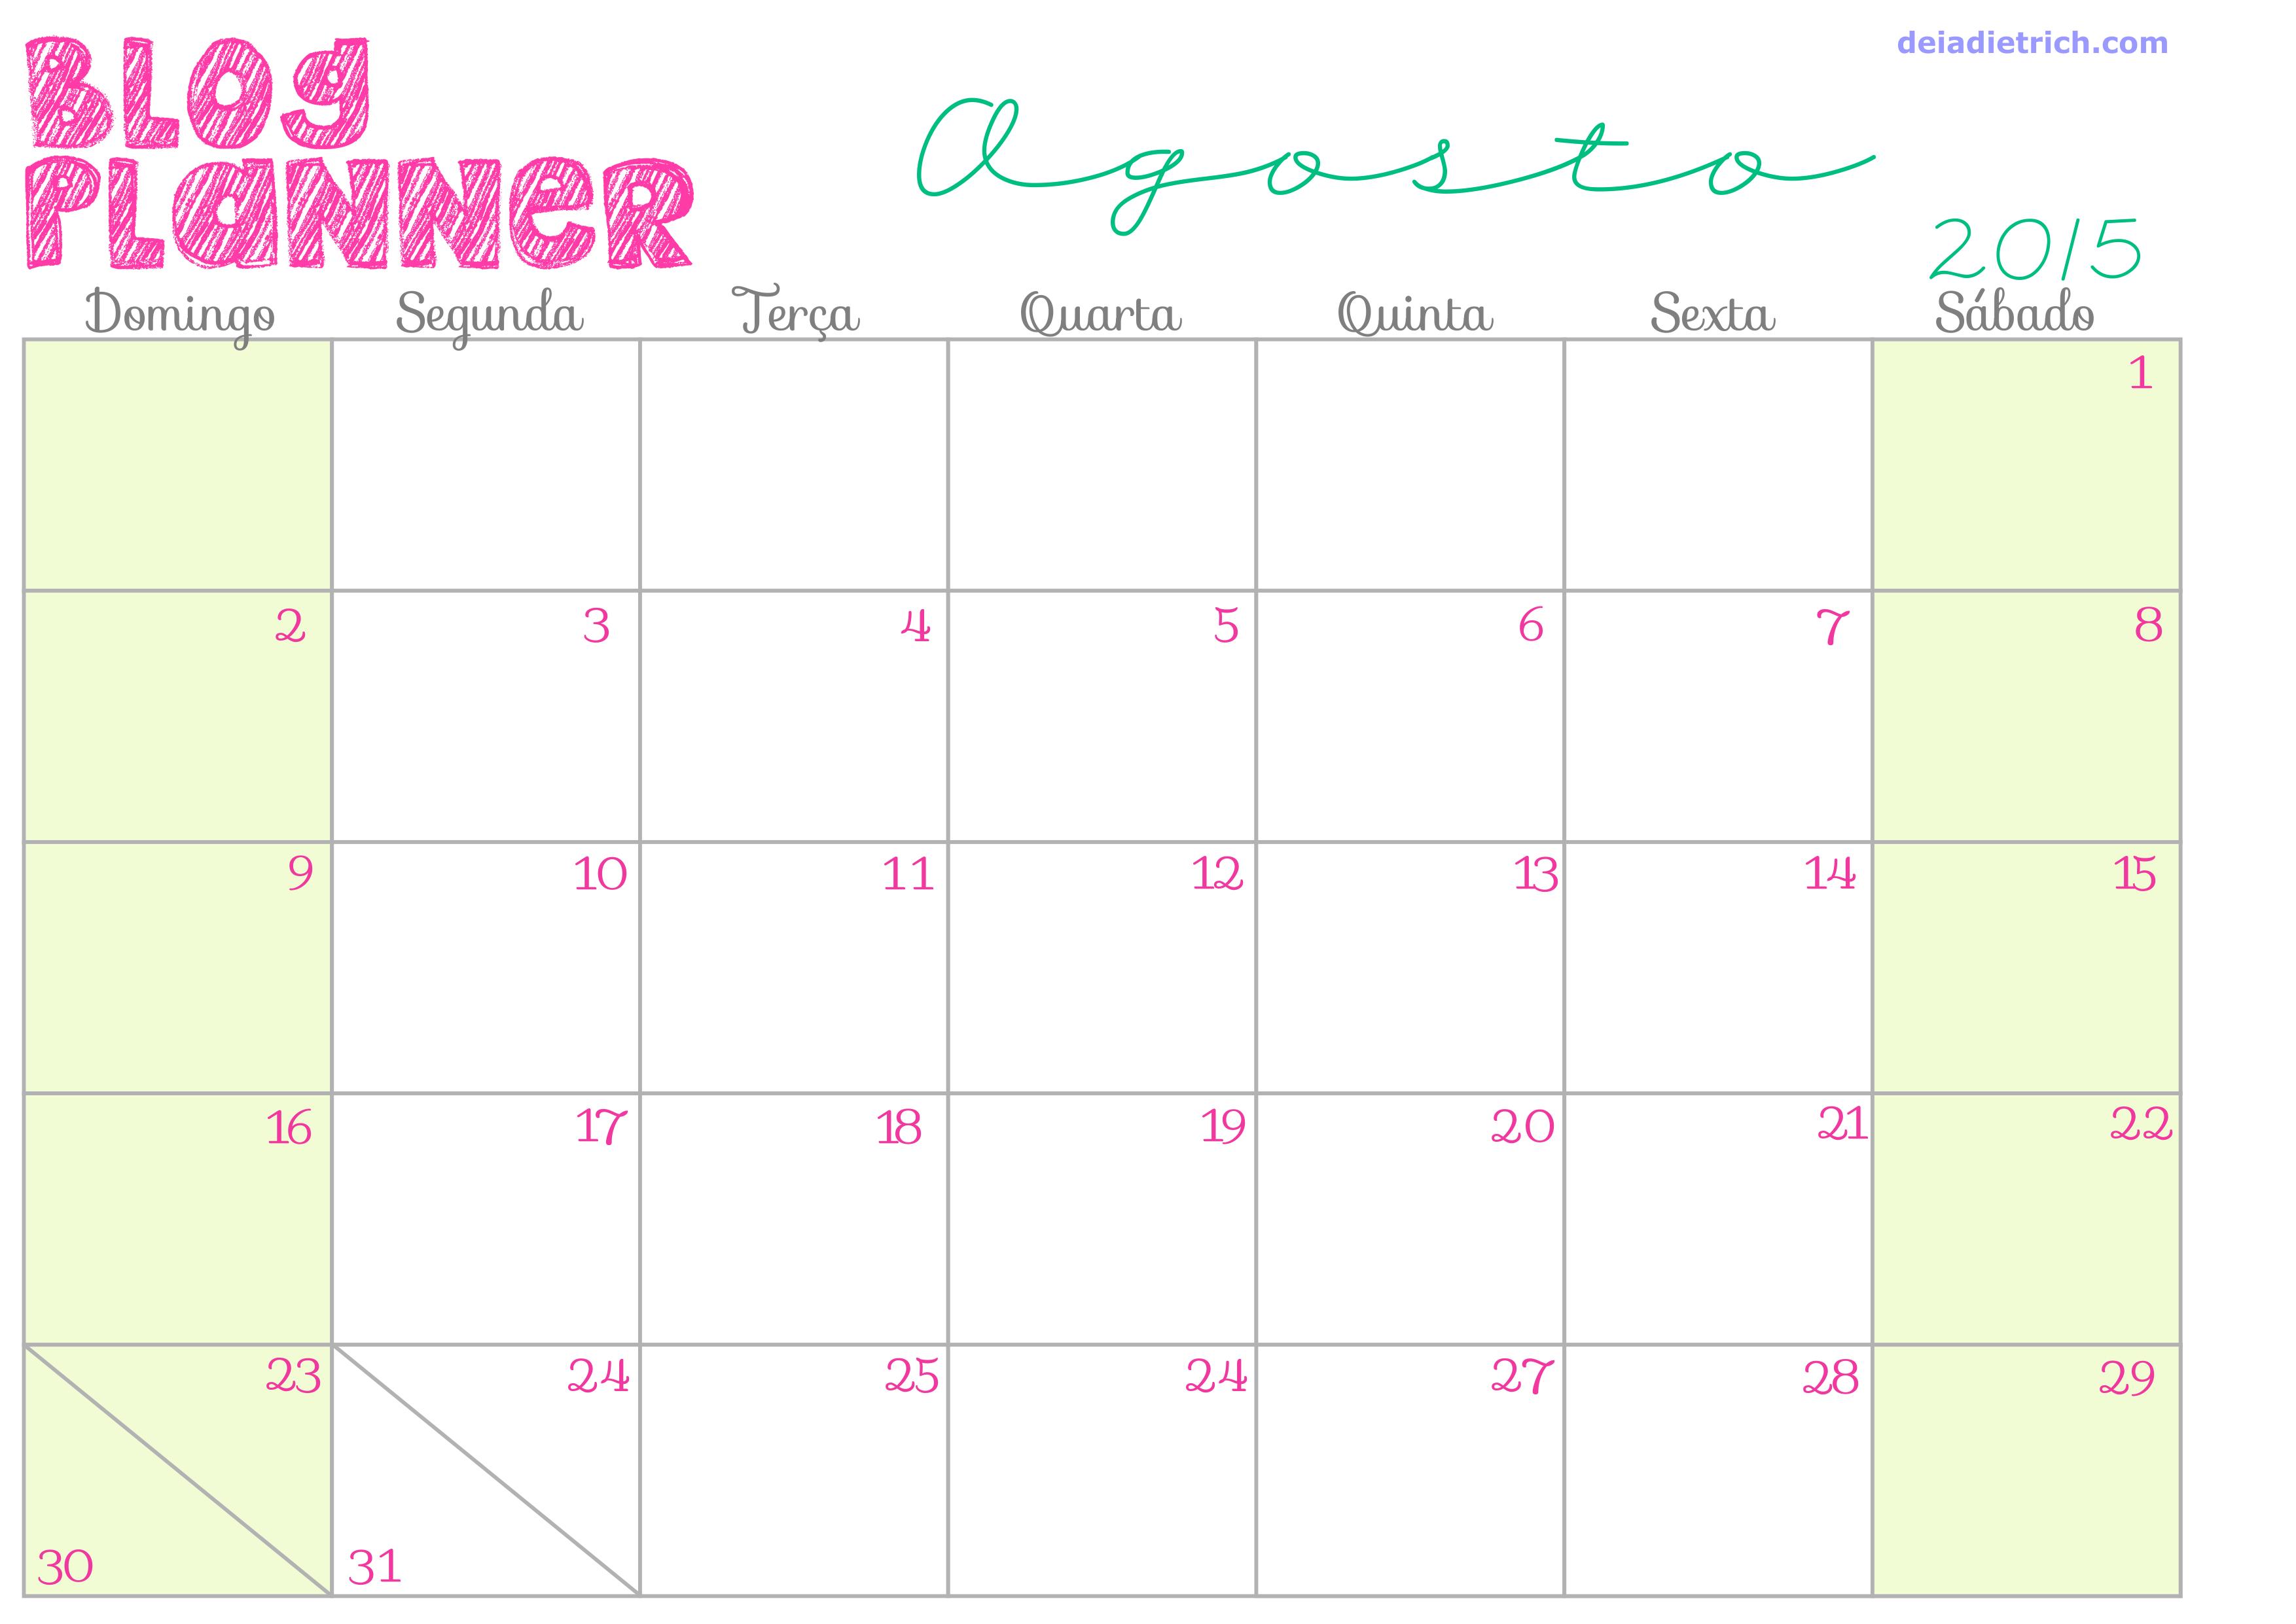 Blog Planner Calendar Printable Free deiadietrich